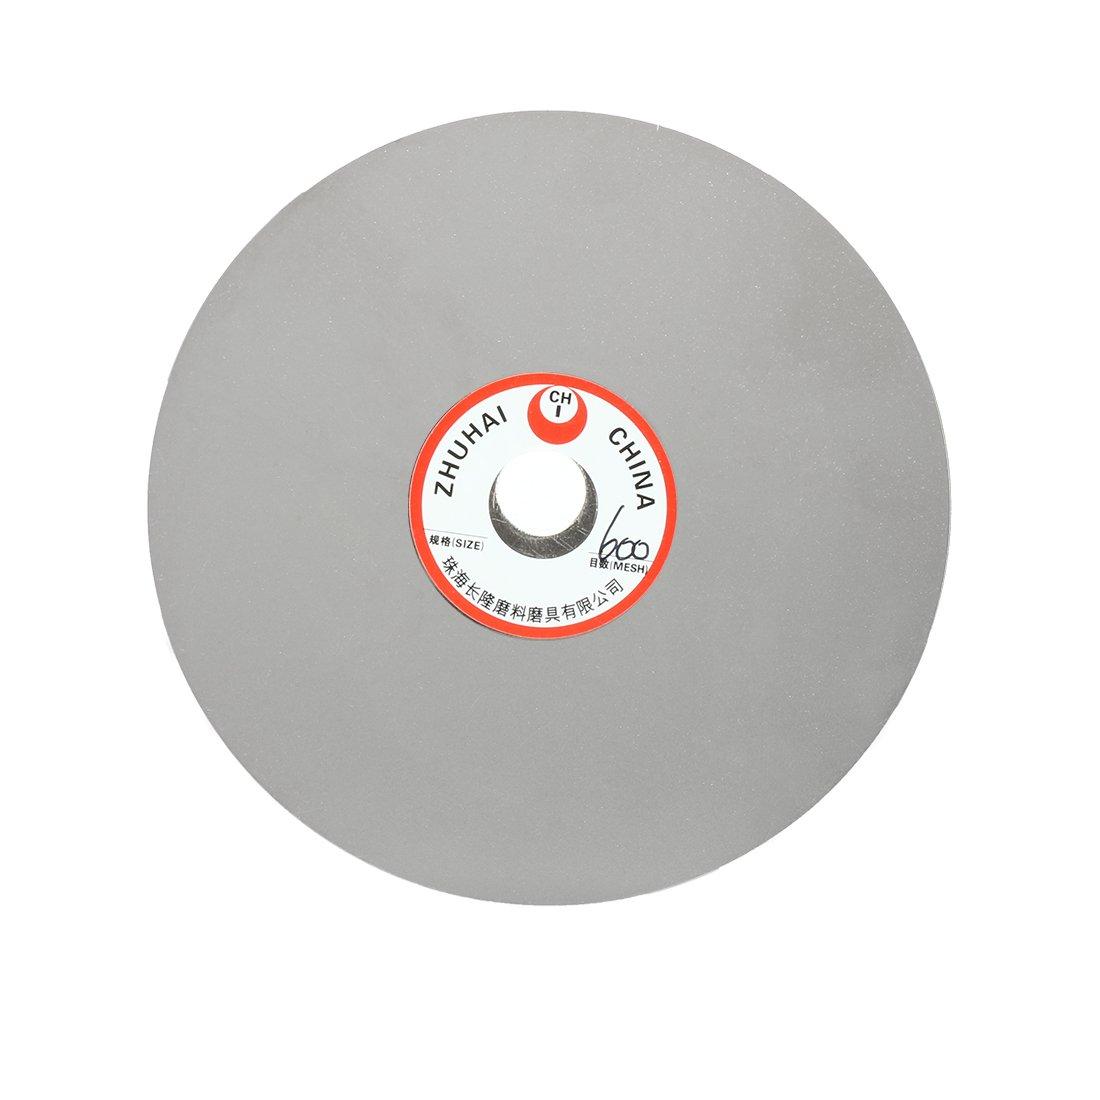 uxcell 6-inch Grit 600 Diamond Coated Flat Lap Wheel Grinding Disc Polishing Tool